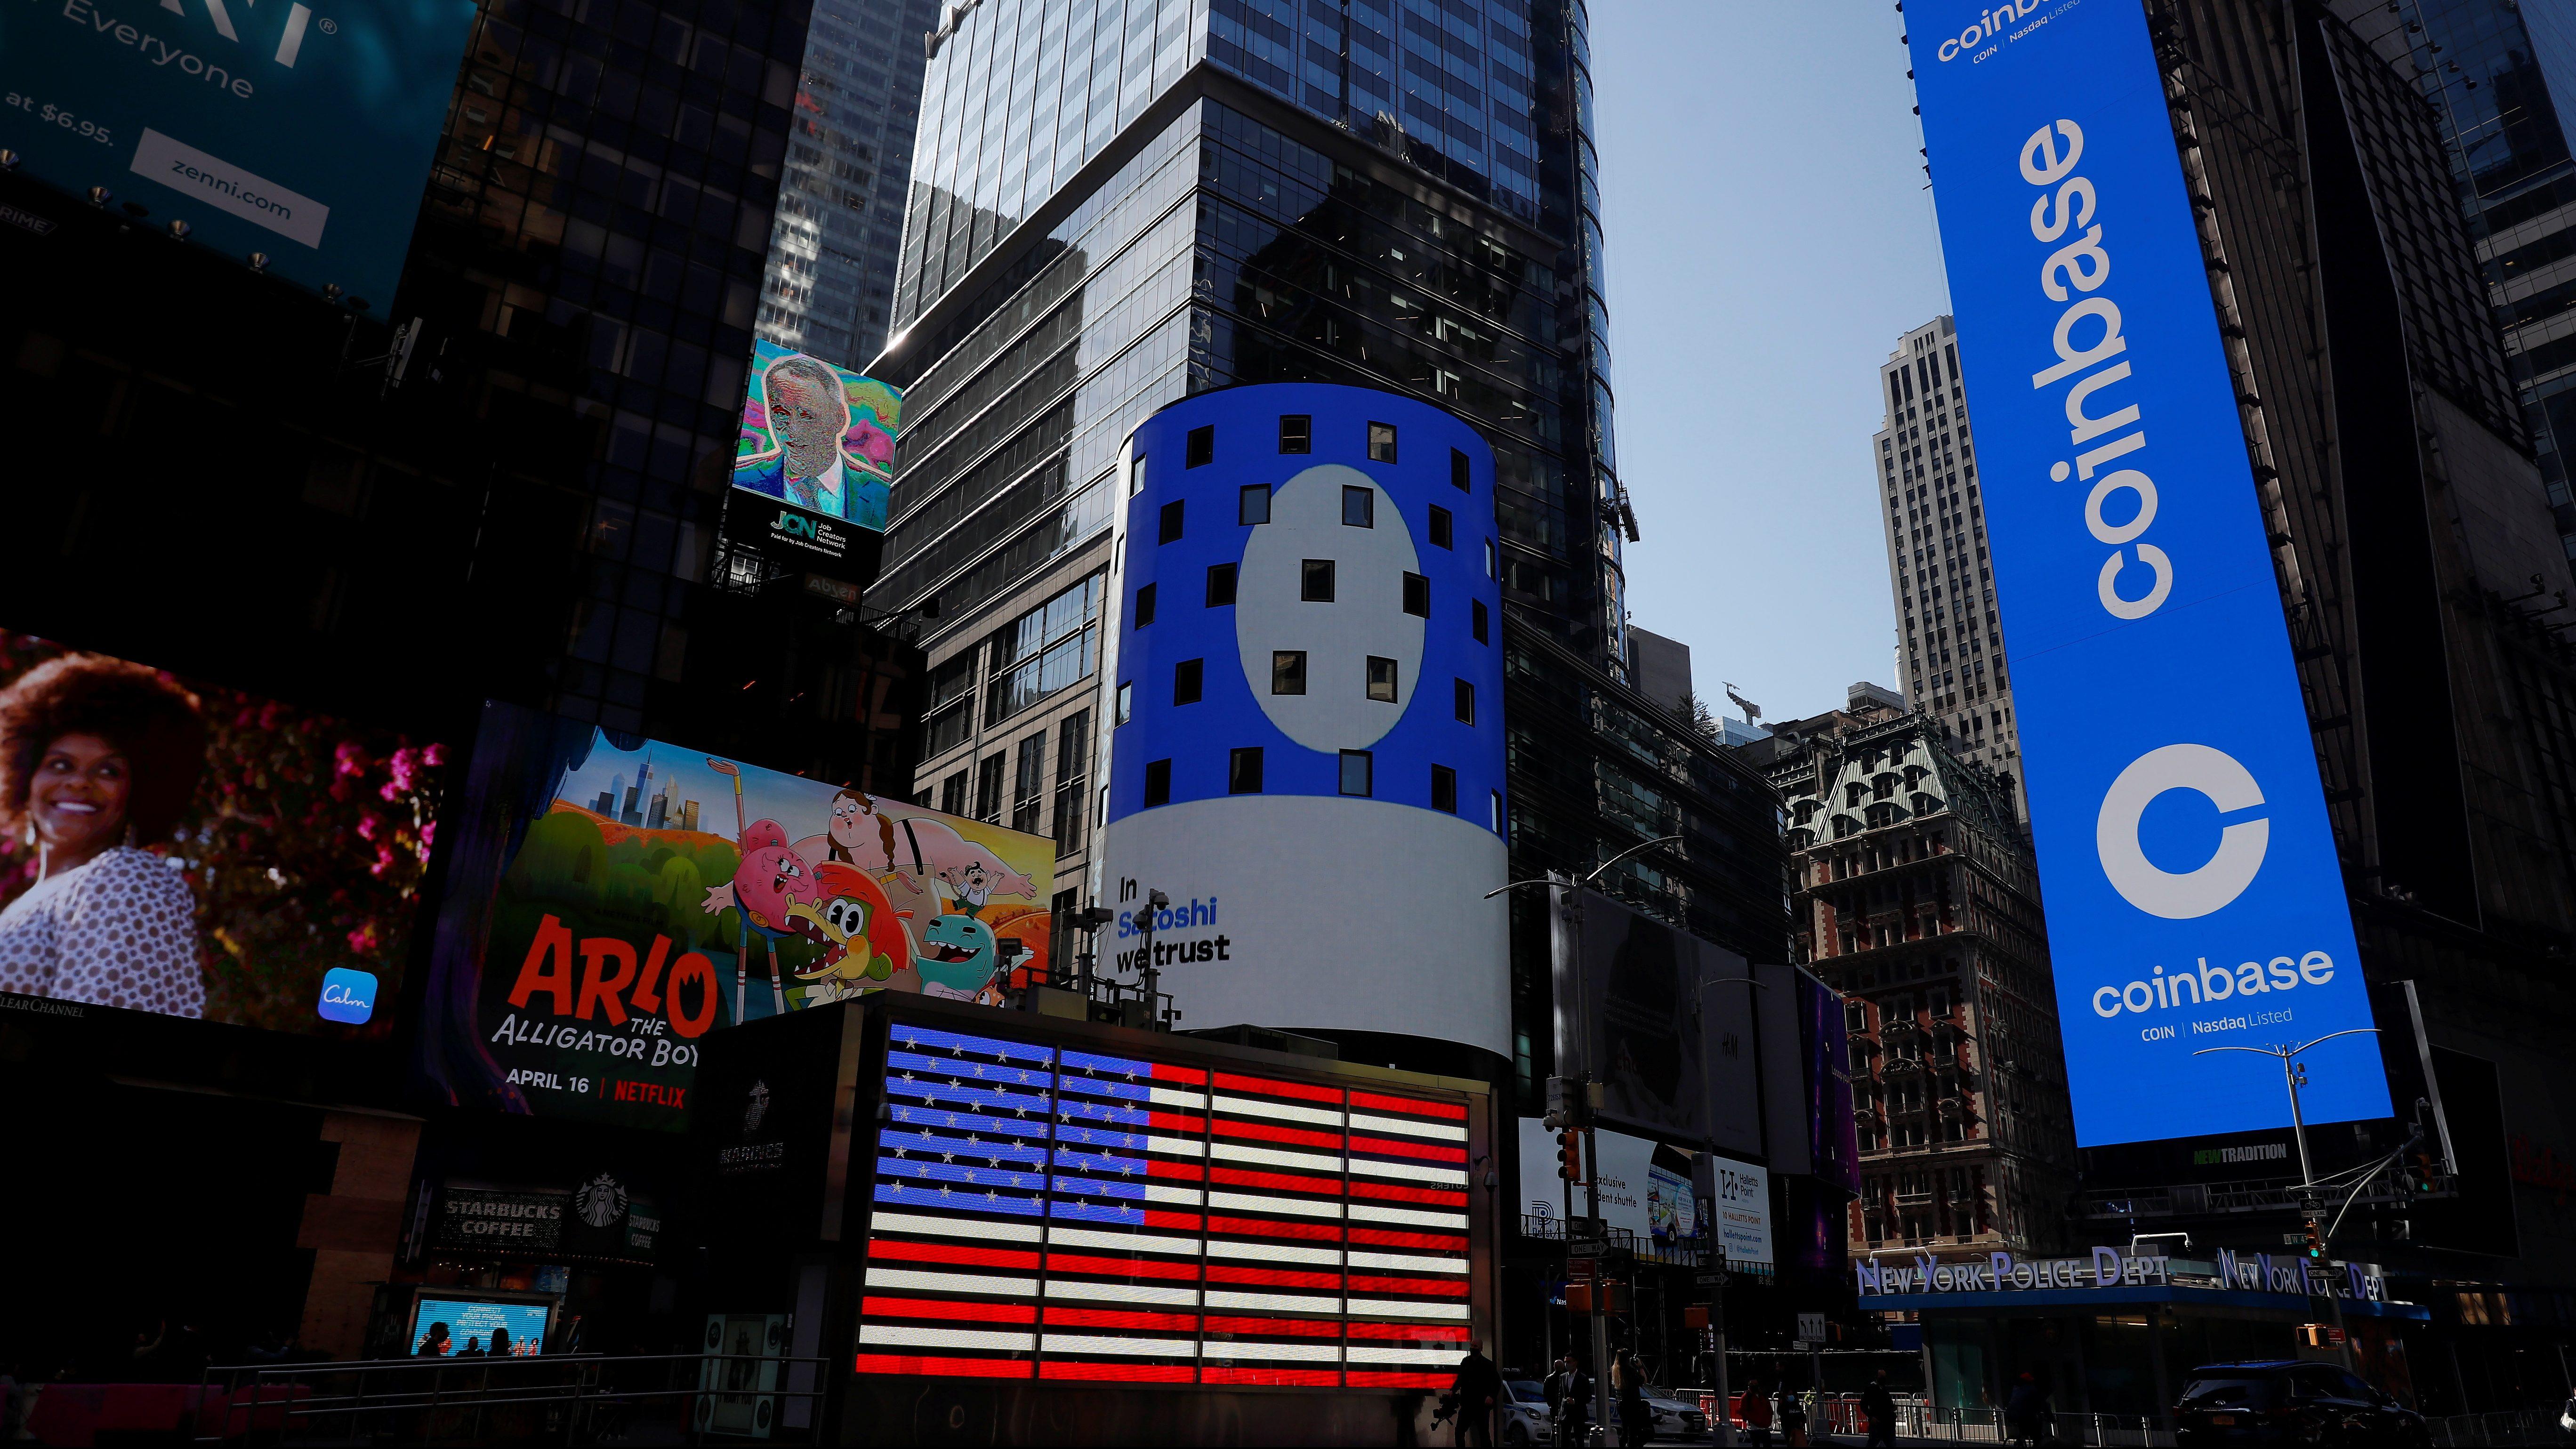 #041 Coinbase IPO   💔 Facebook   ❤️ Signal   eBang   RIOT Blockchain   Lilium SPAC